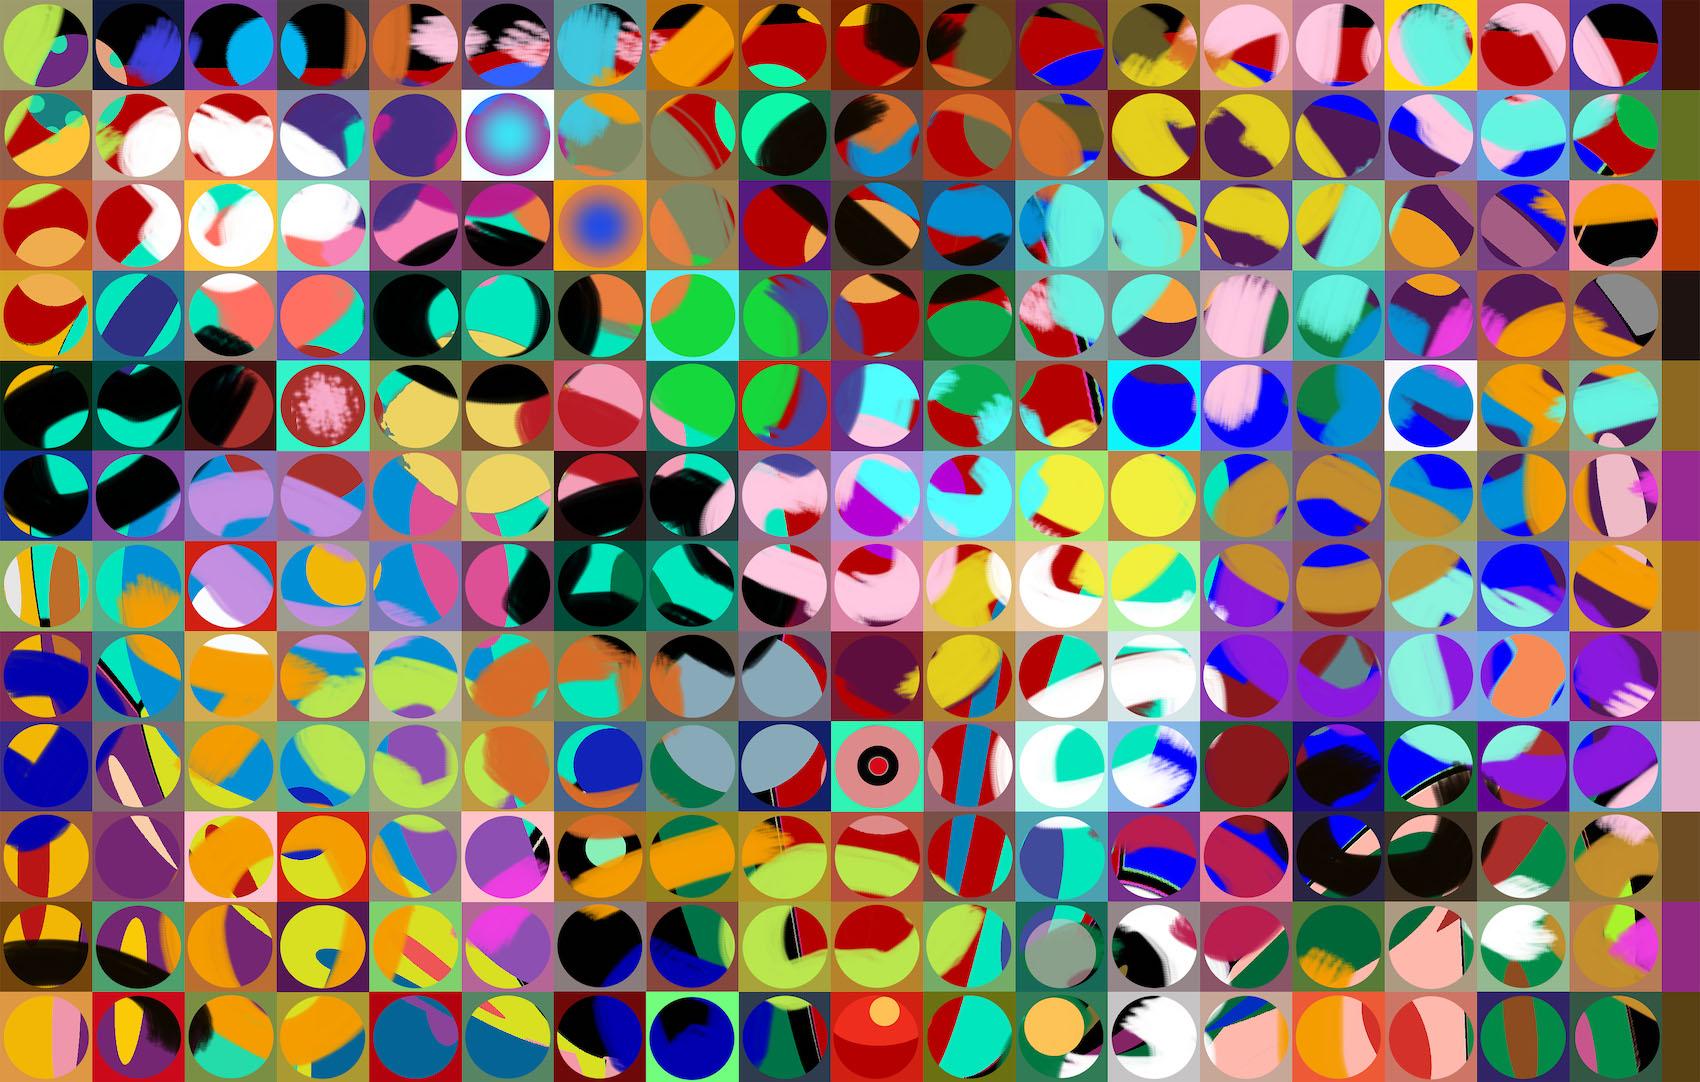 RogelioMaxwell-Hard Pull-2008-ArchivalPigmentPrint-24x36-$1700.jpg